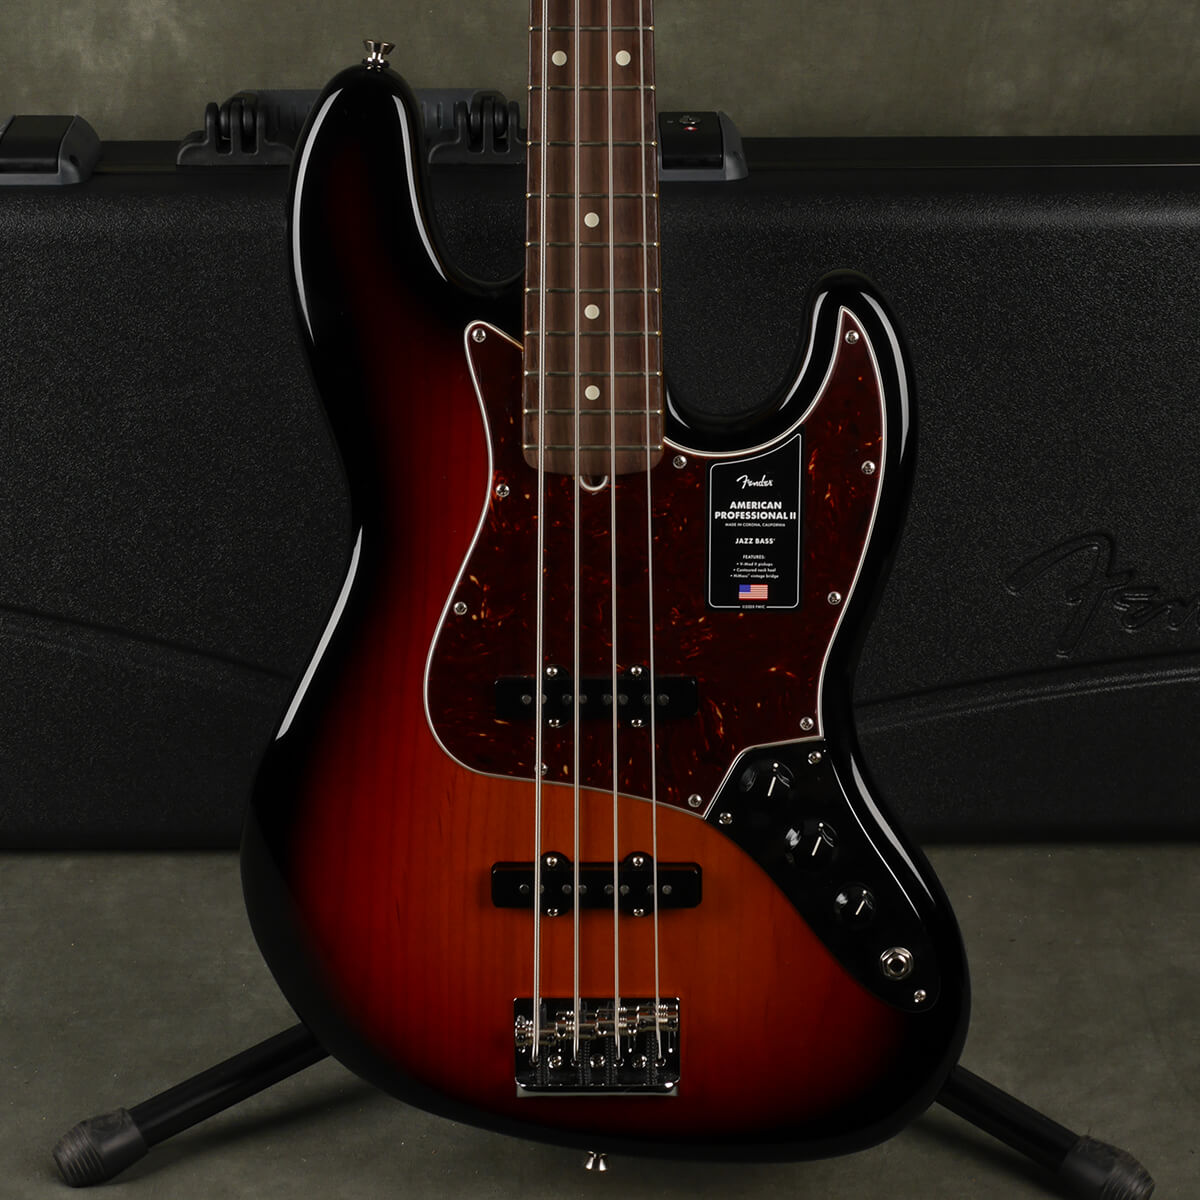 Fender American Pro II Jazz Bass - 3-Tone Sunburst w/Hard Case - 2nd Hand